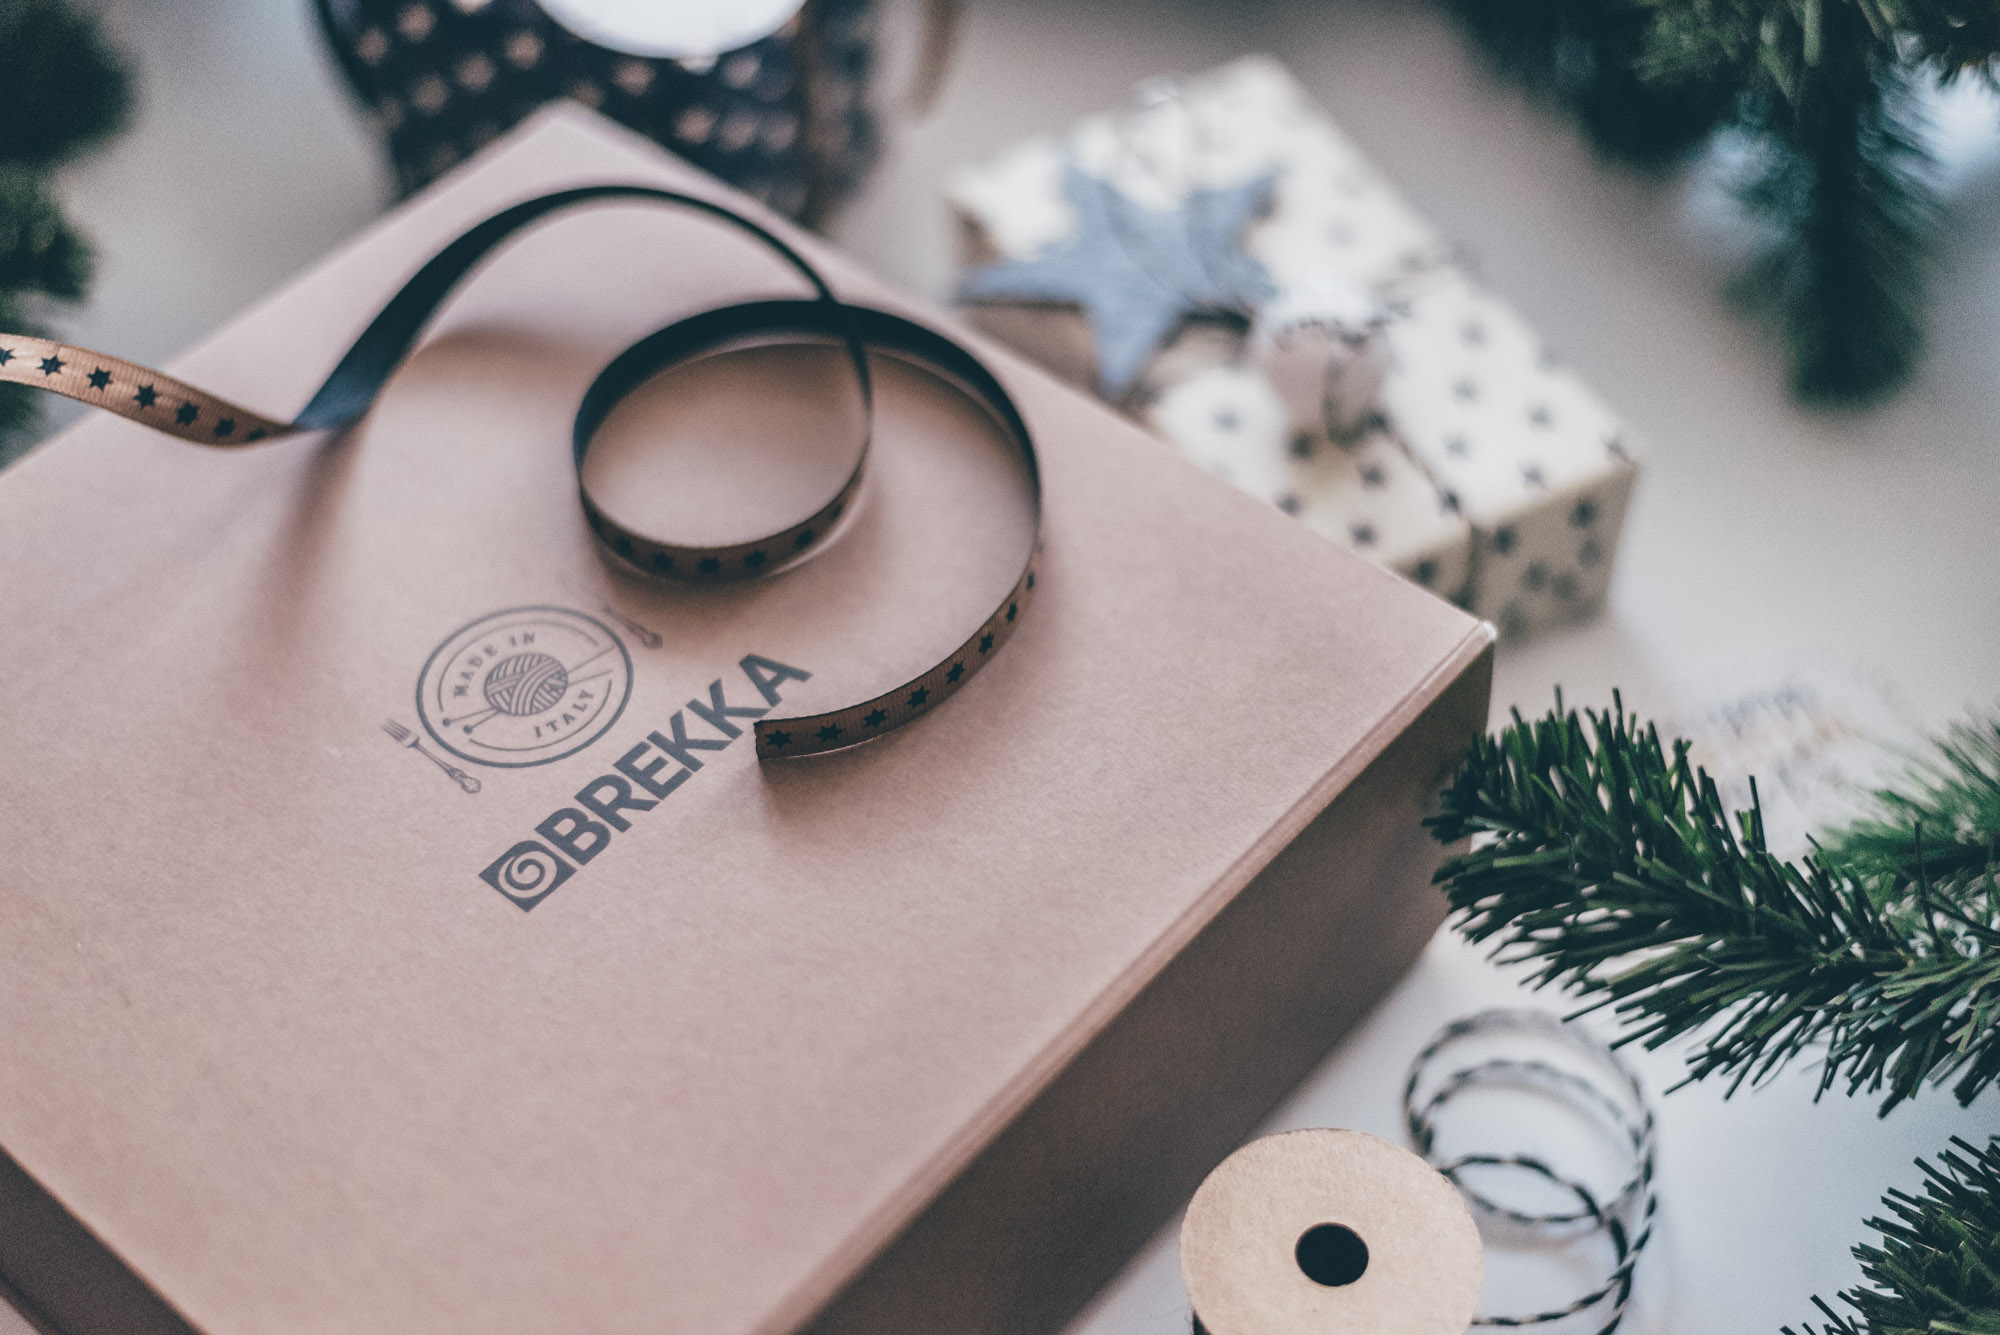 Christmas Gift Guide for Him   Braun Beard Trimmer   Lisa Fiege